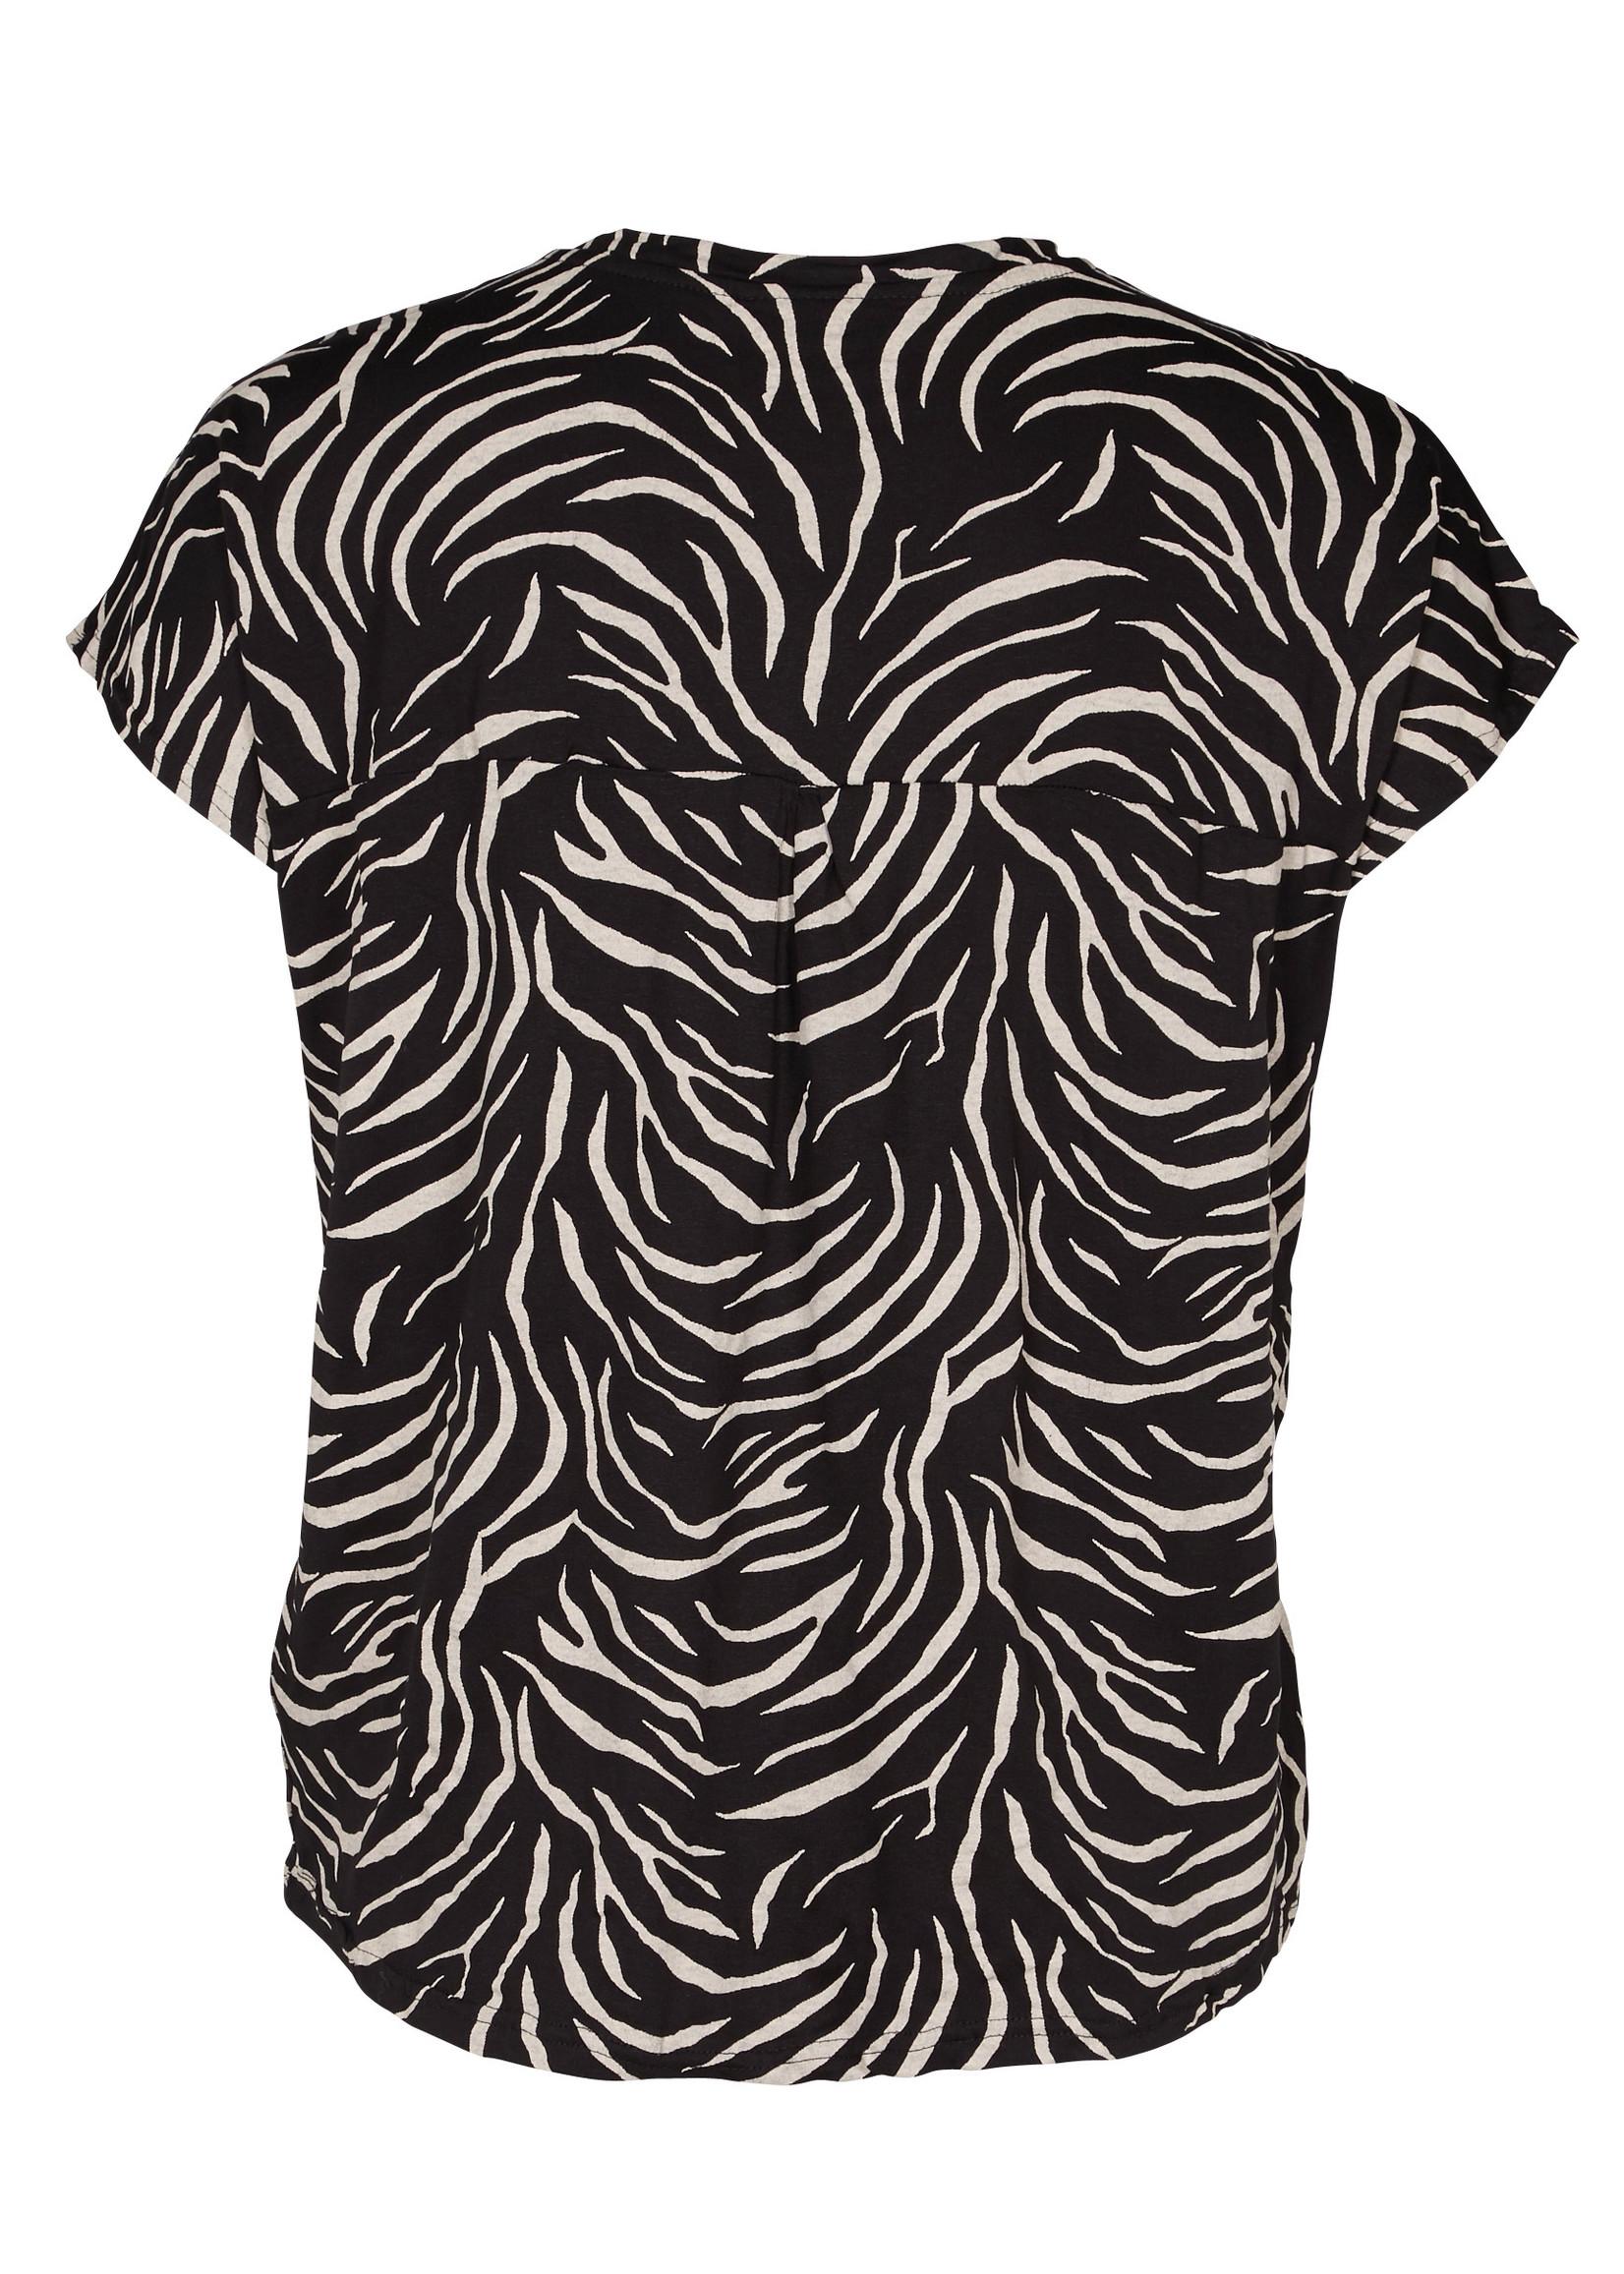 Zoey Zoey Kelly T-shirt